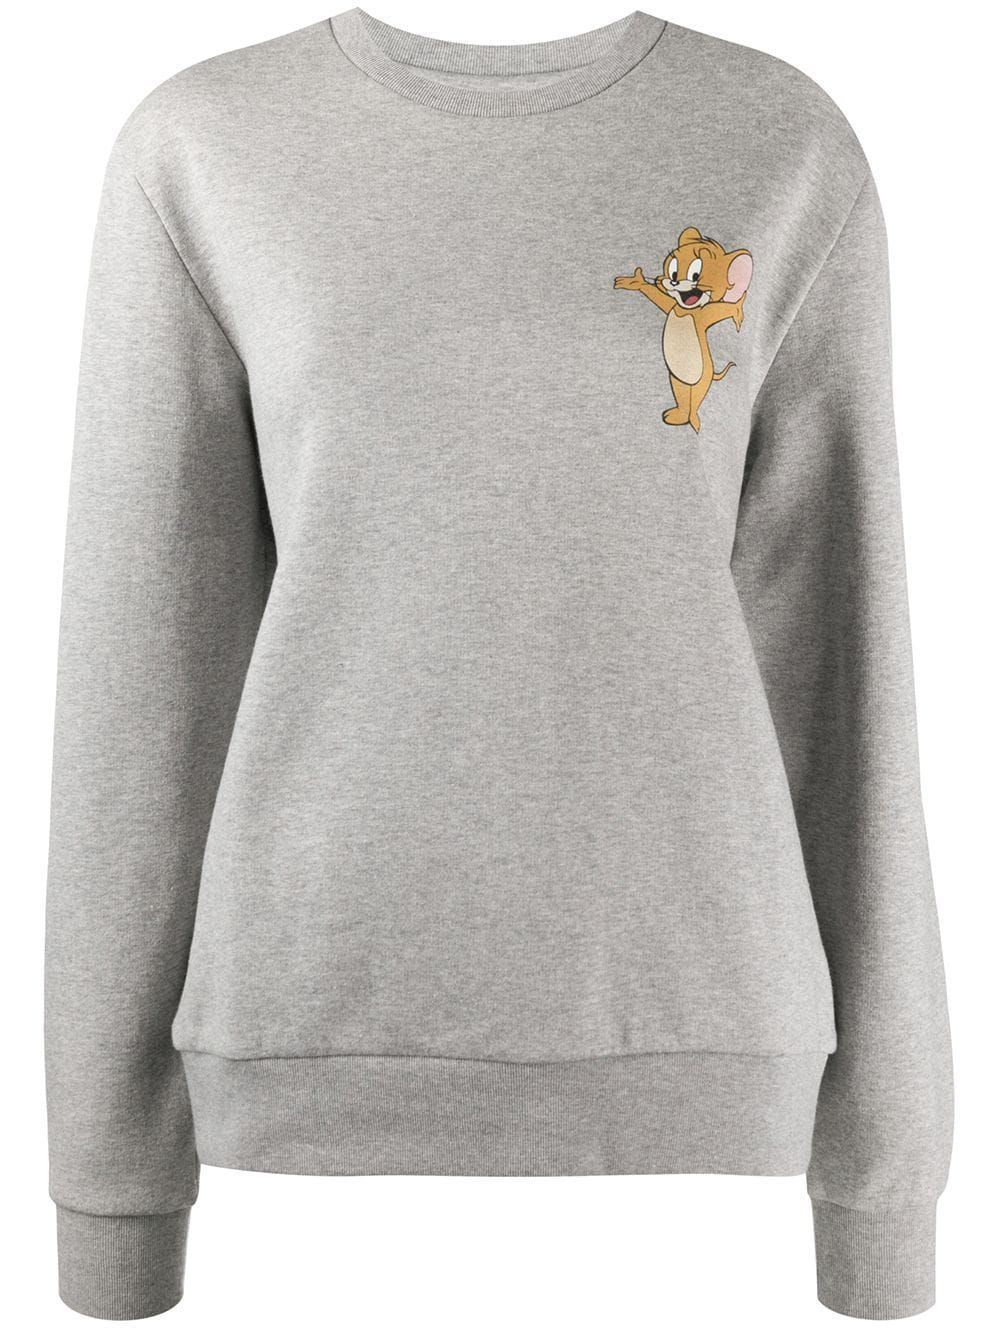 Etro Tom And Jerry Print Sweatshirt Farfetch Printed Sweatshirts Sweatshirts Etro [ 1334 x 1000 Pixel ]